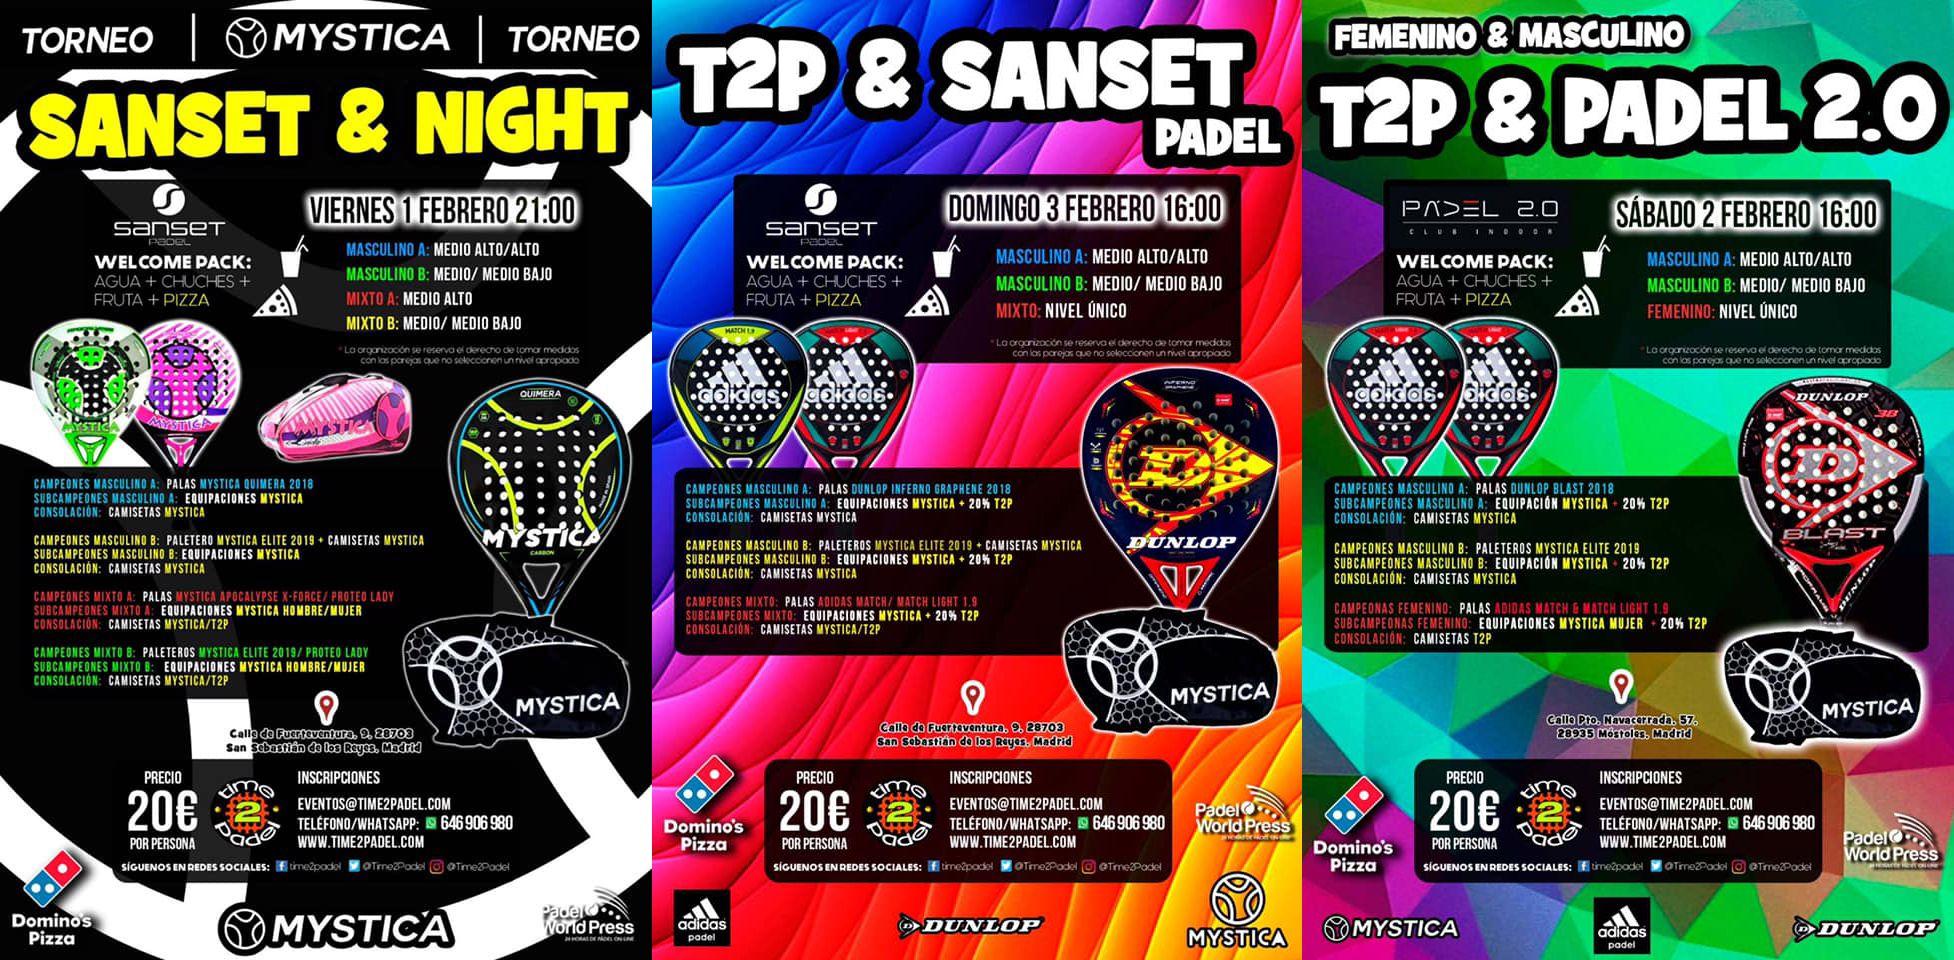 La oferta de Torneos Time2Padel para esta semana.